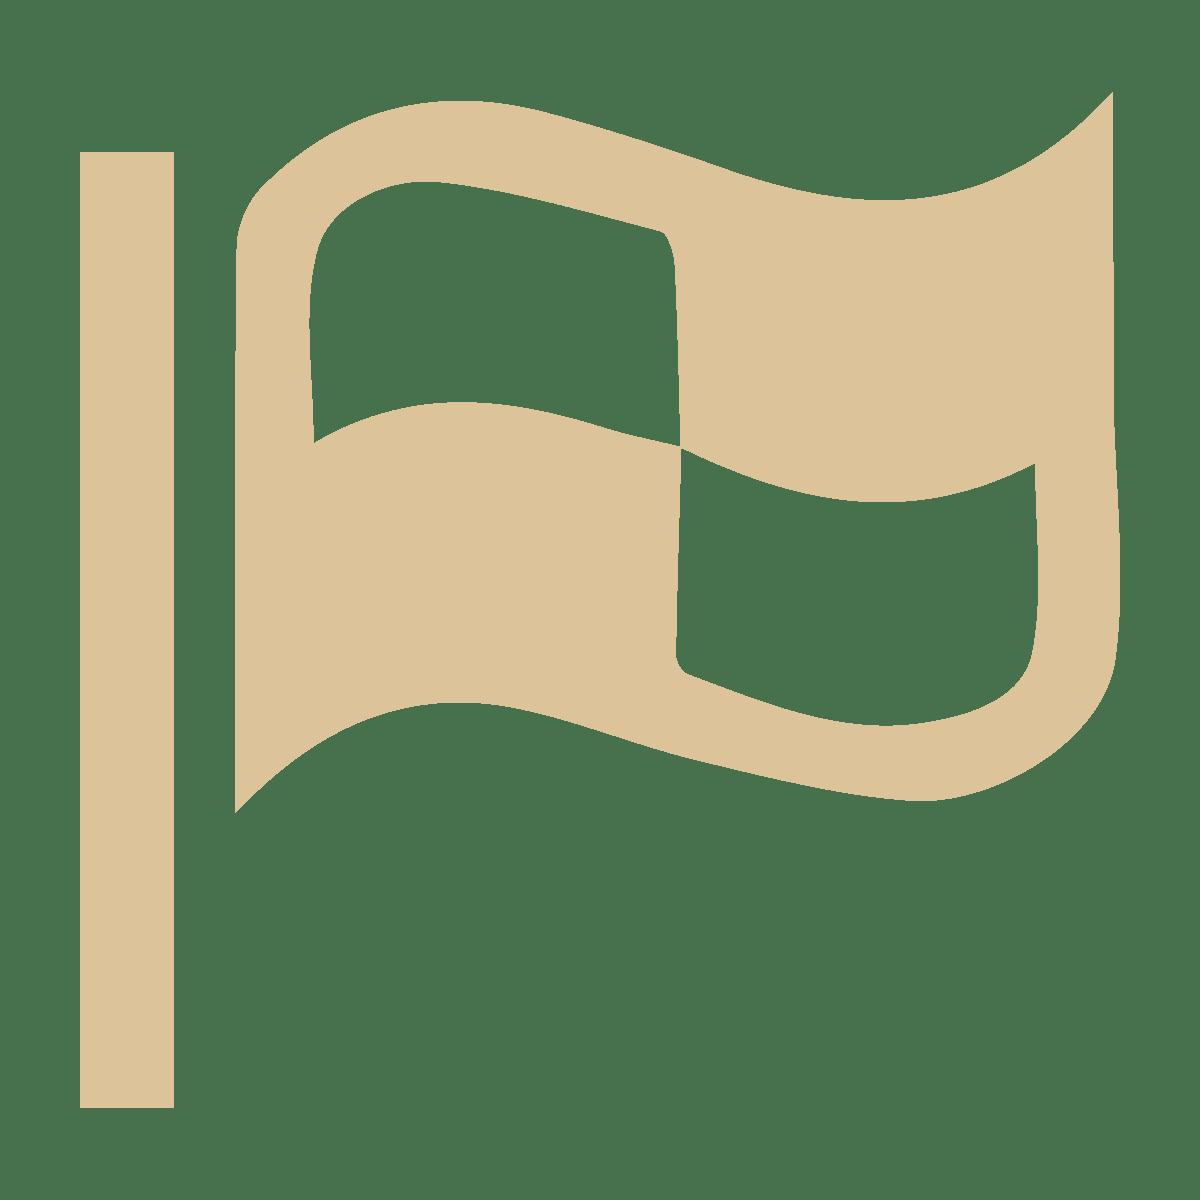 arvense-group-5f-methodology-step-5-finish-tan